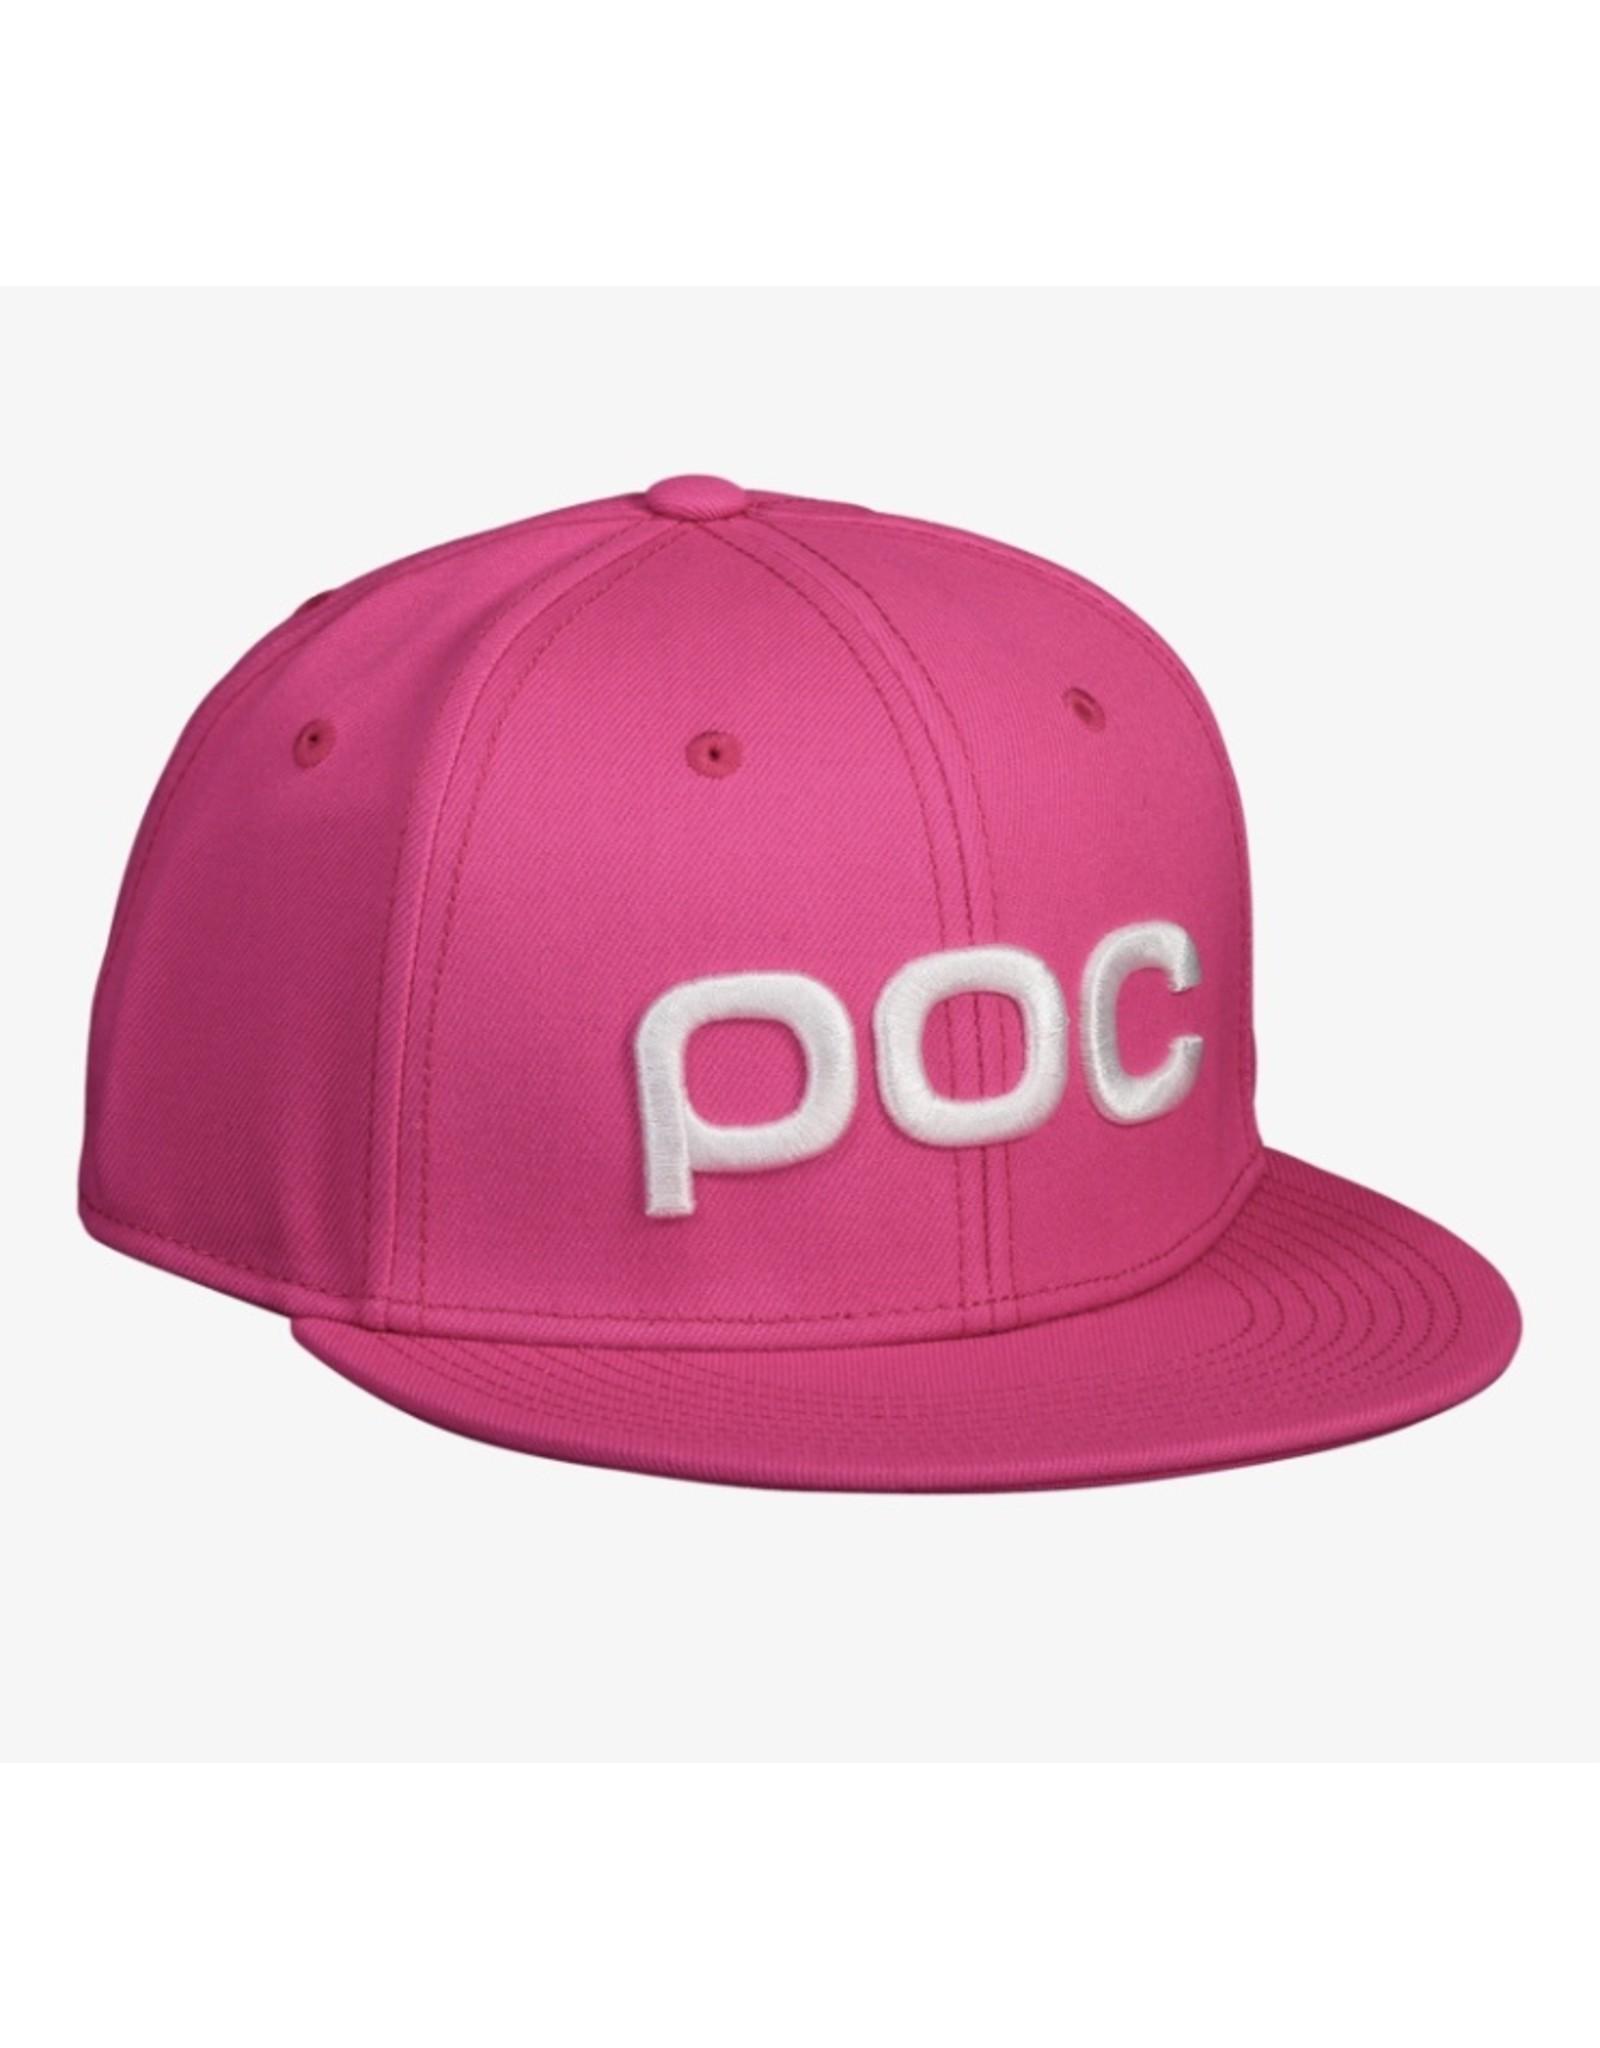 POC POC Corp Cap Rhodonite Pink